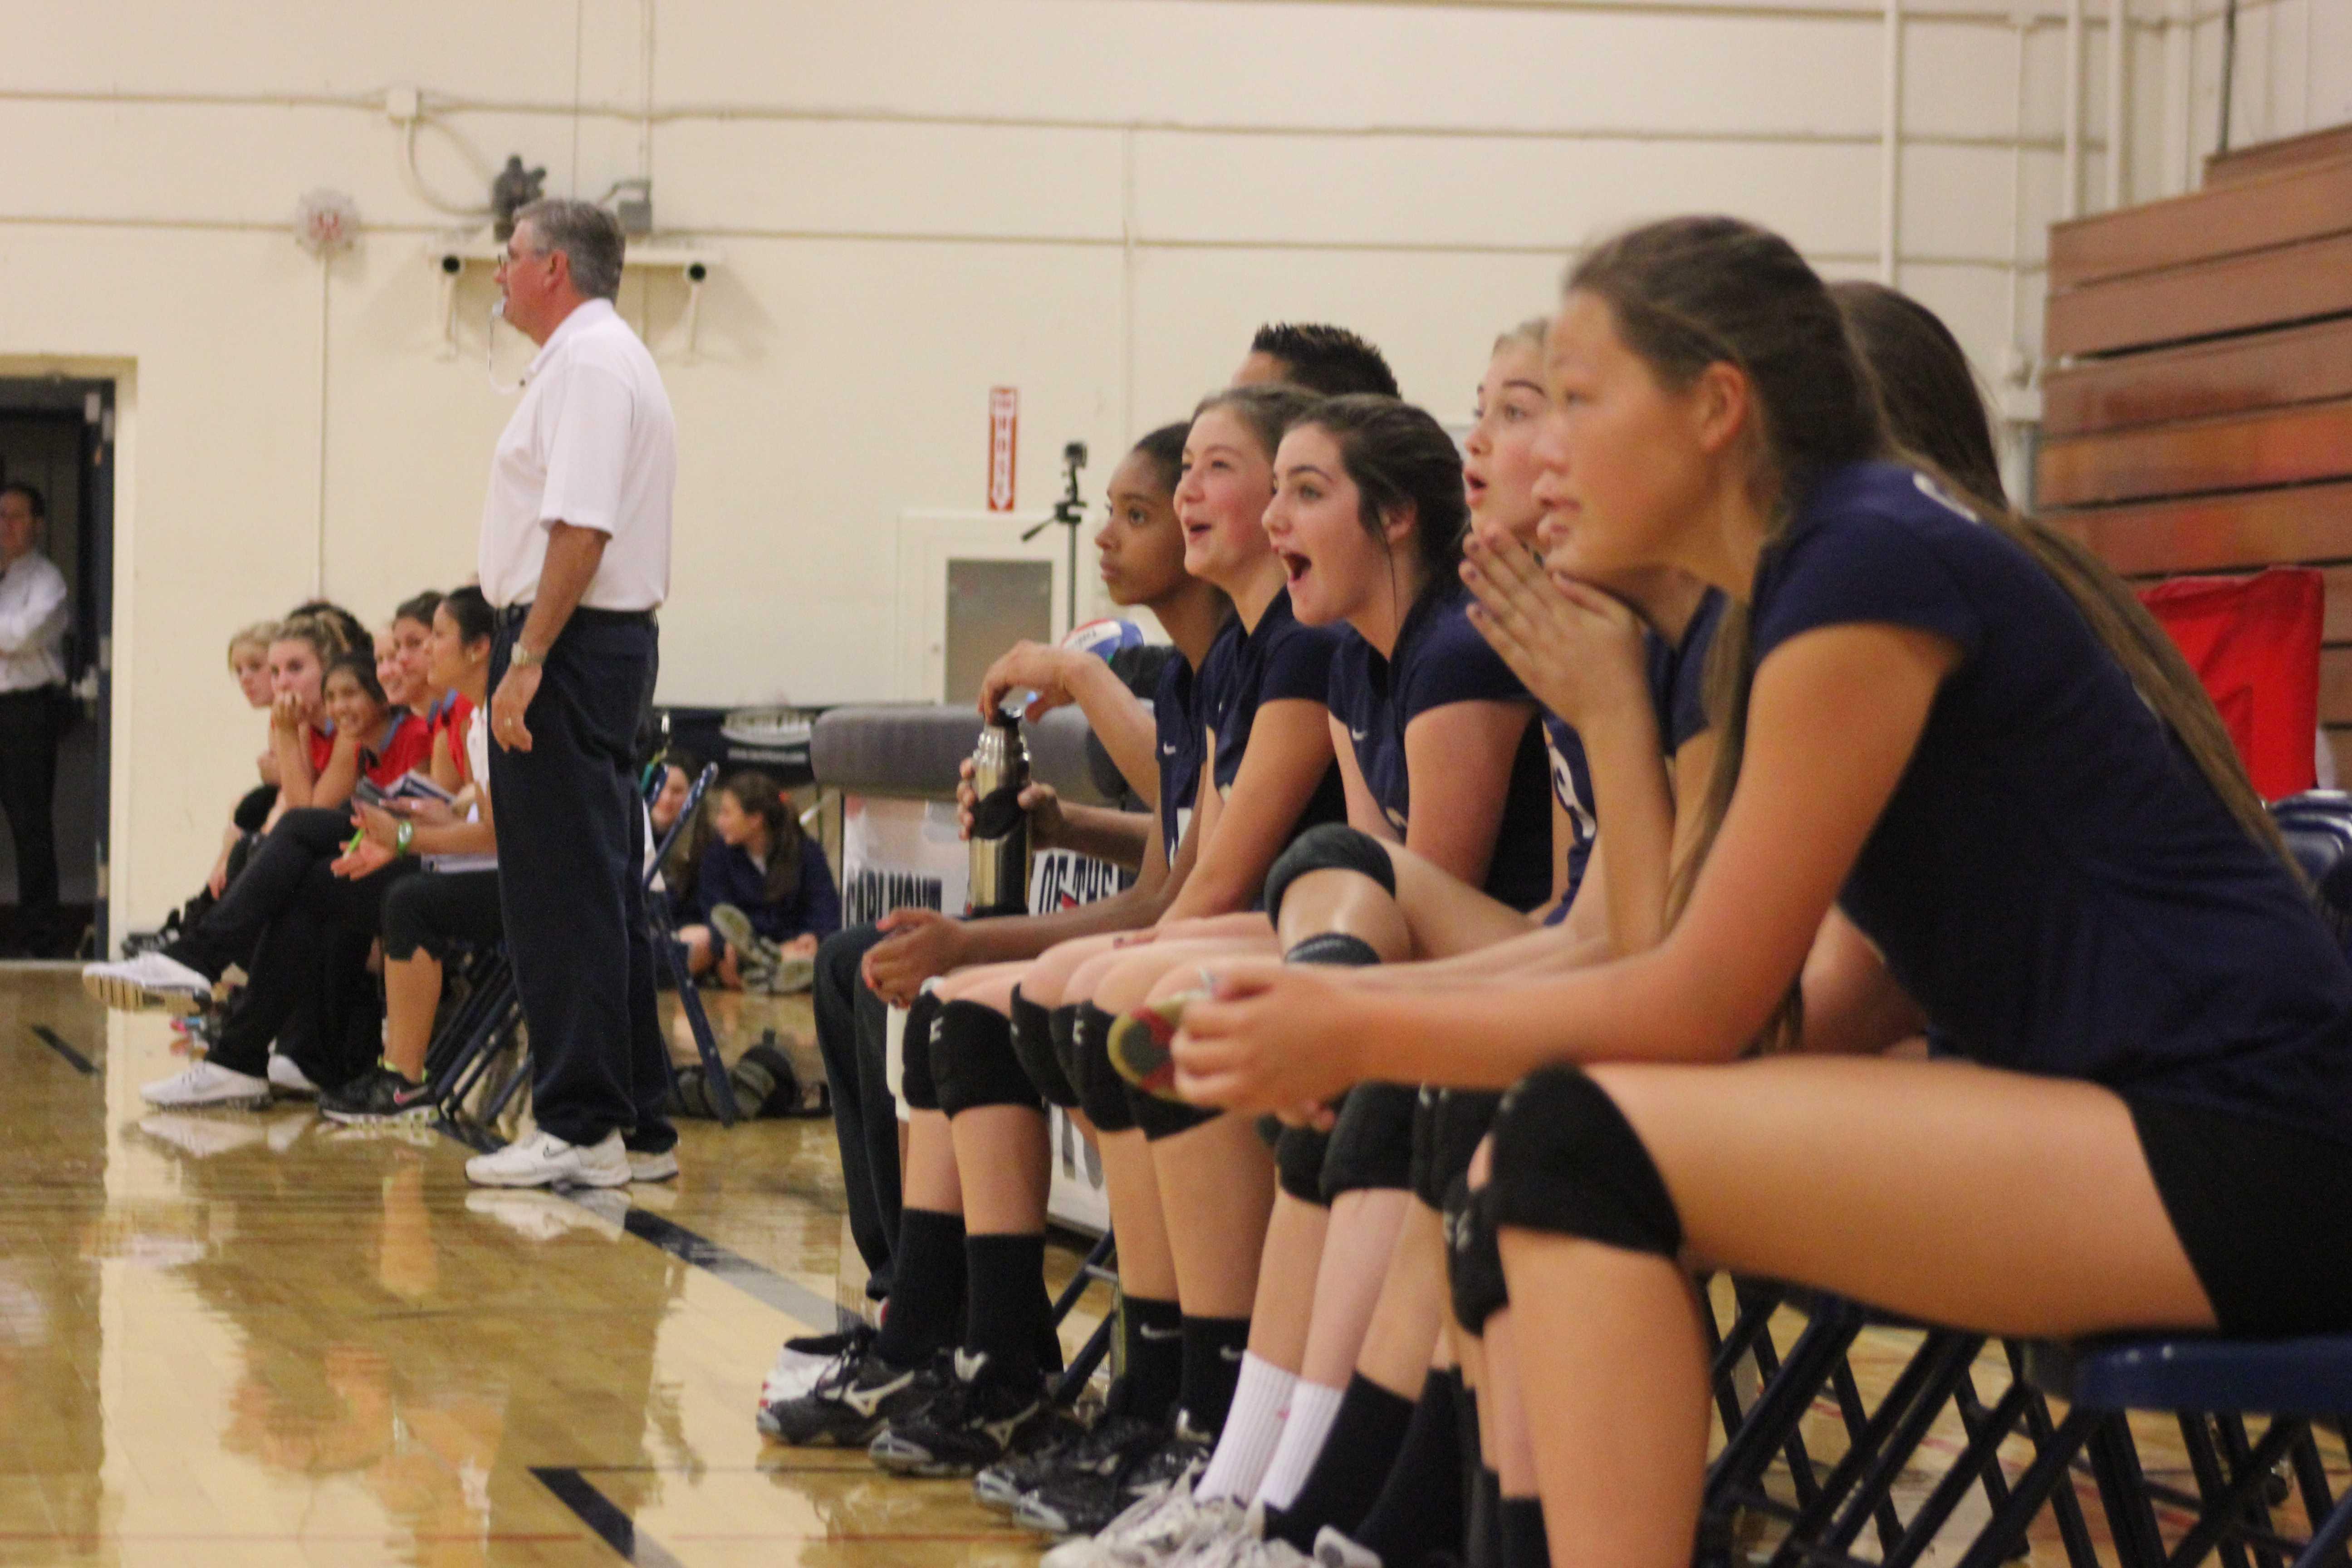 A promising season ahead for JV volleyball